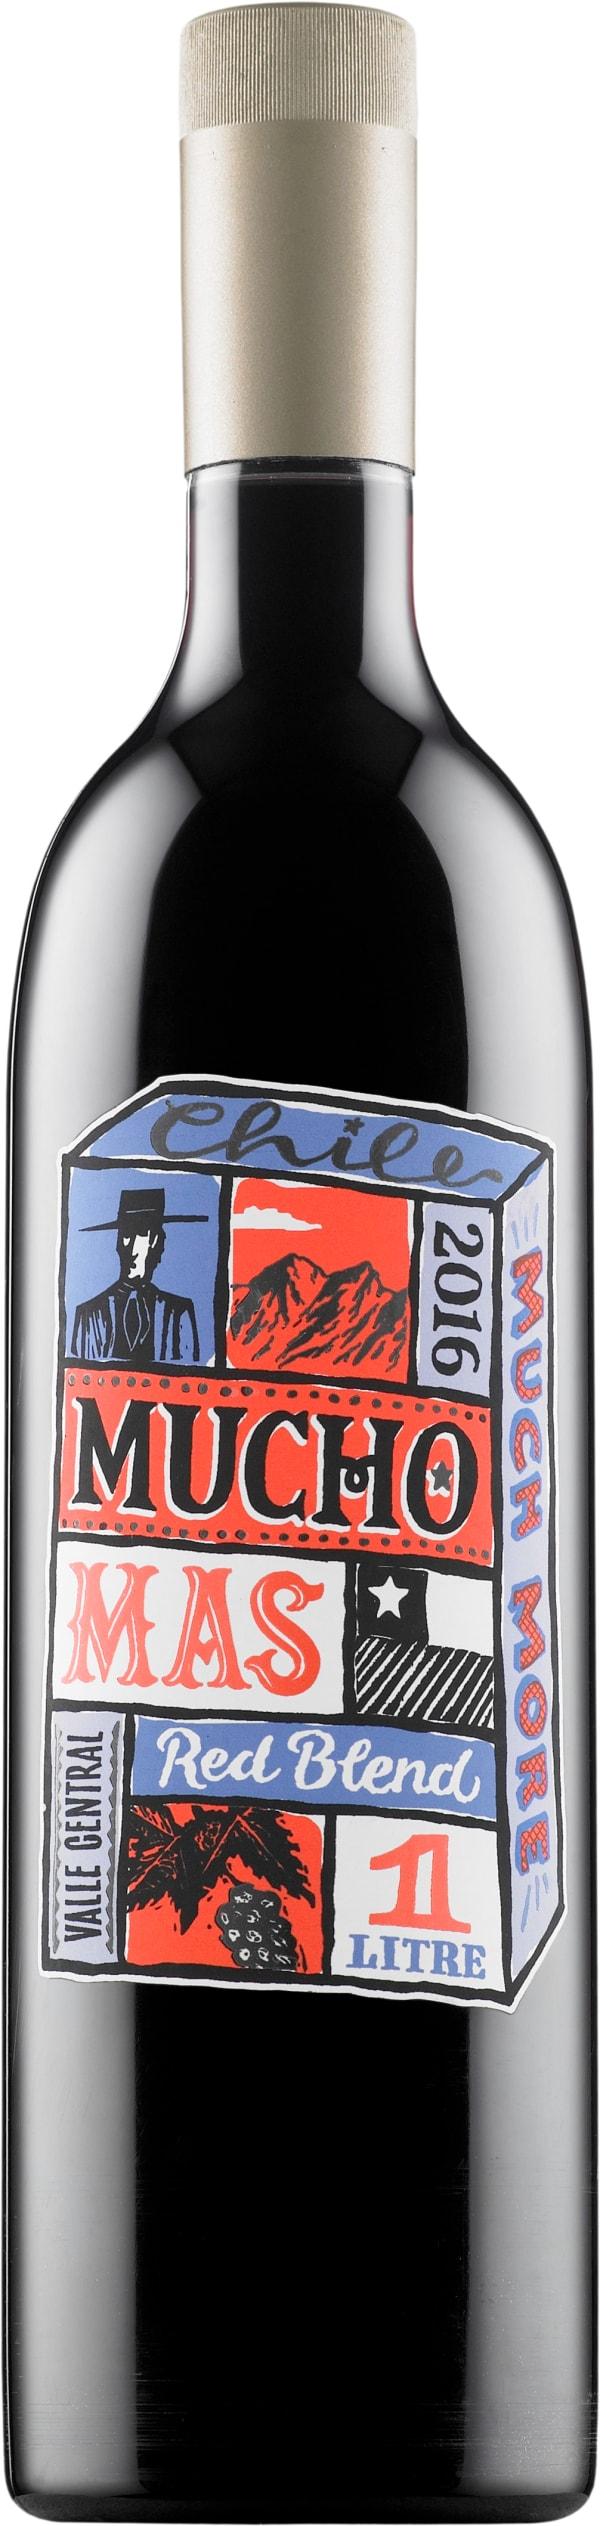 Mucho Mas Red Blend 2017 plastic bottle